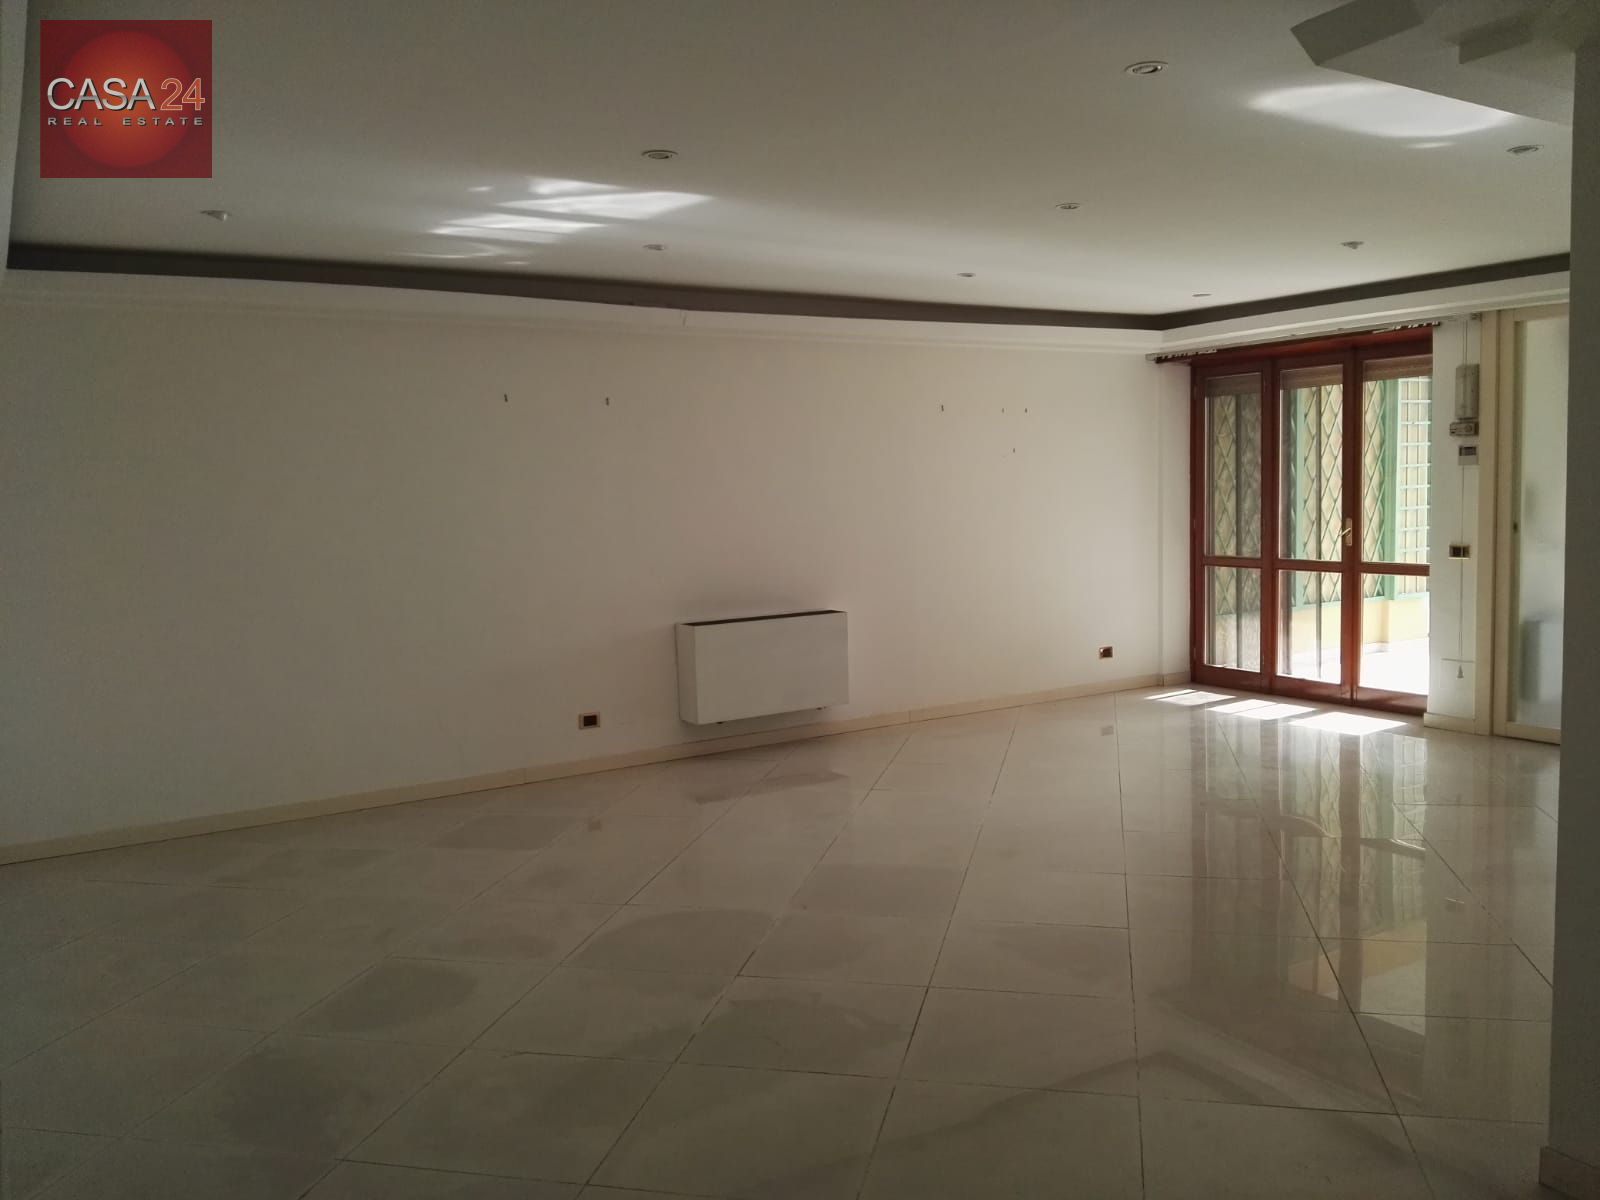 latina vendita quart: r0 zona centrale casa24-real-estate